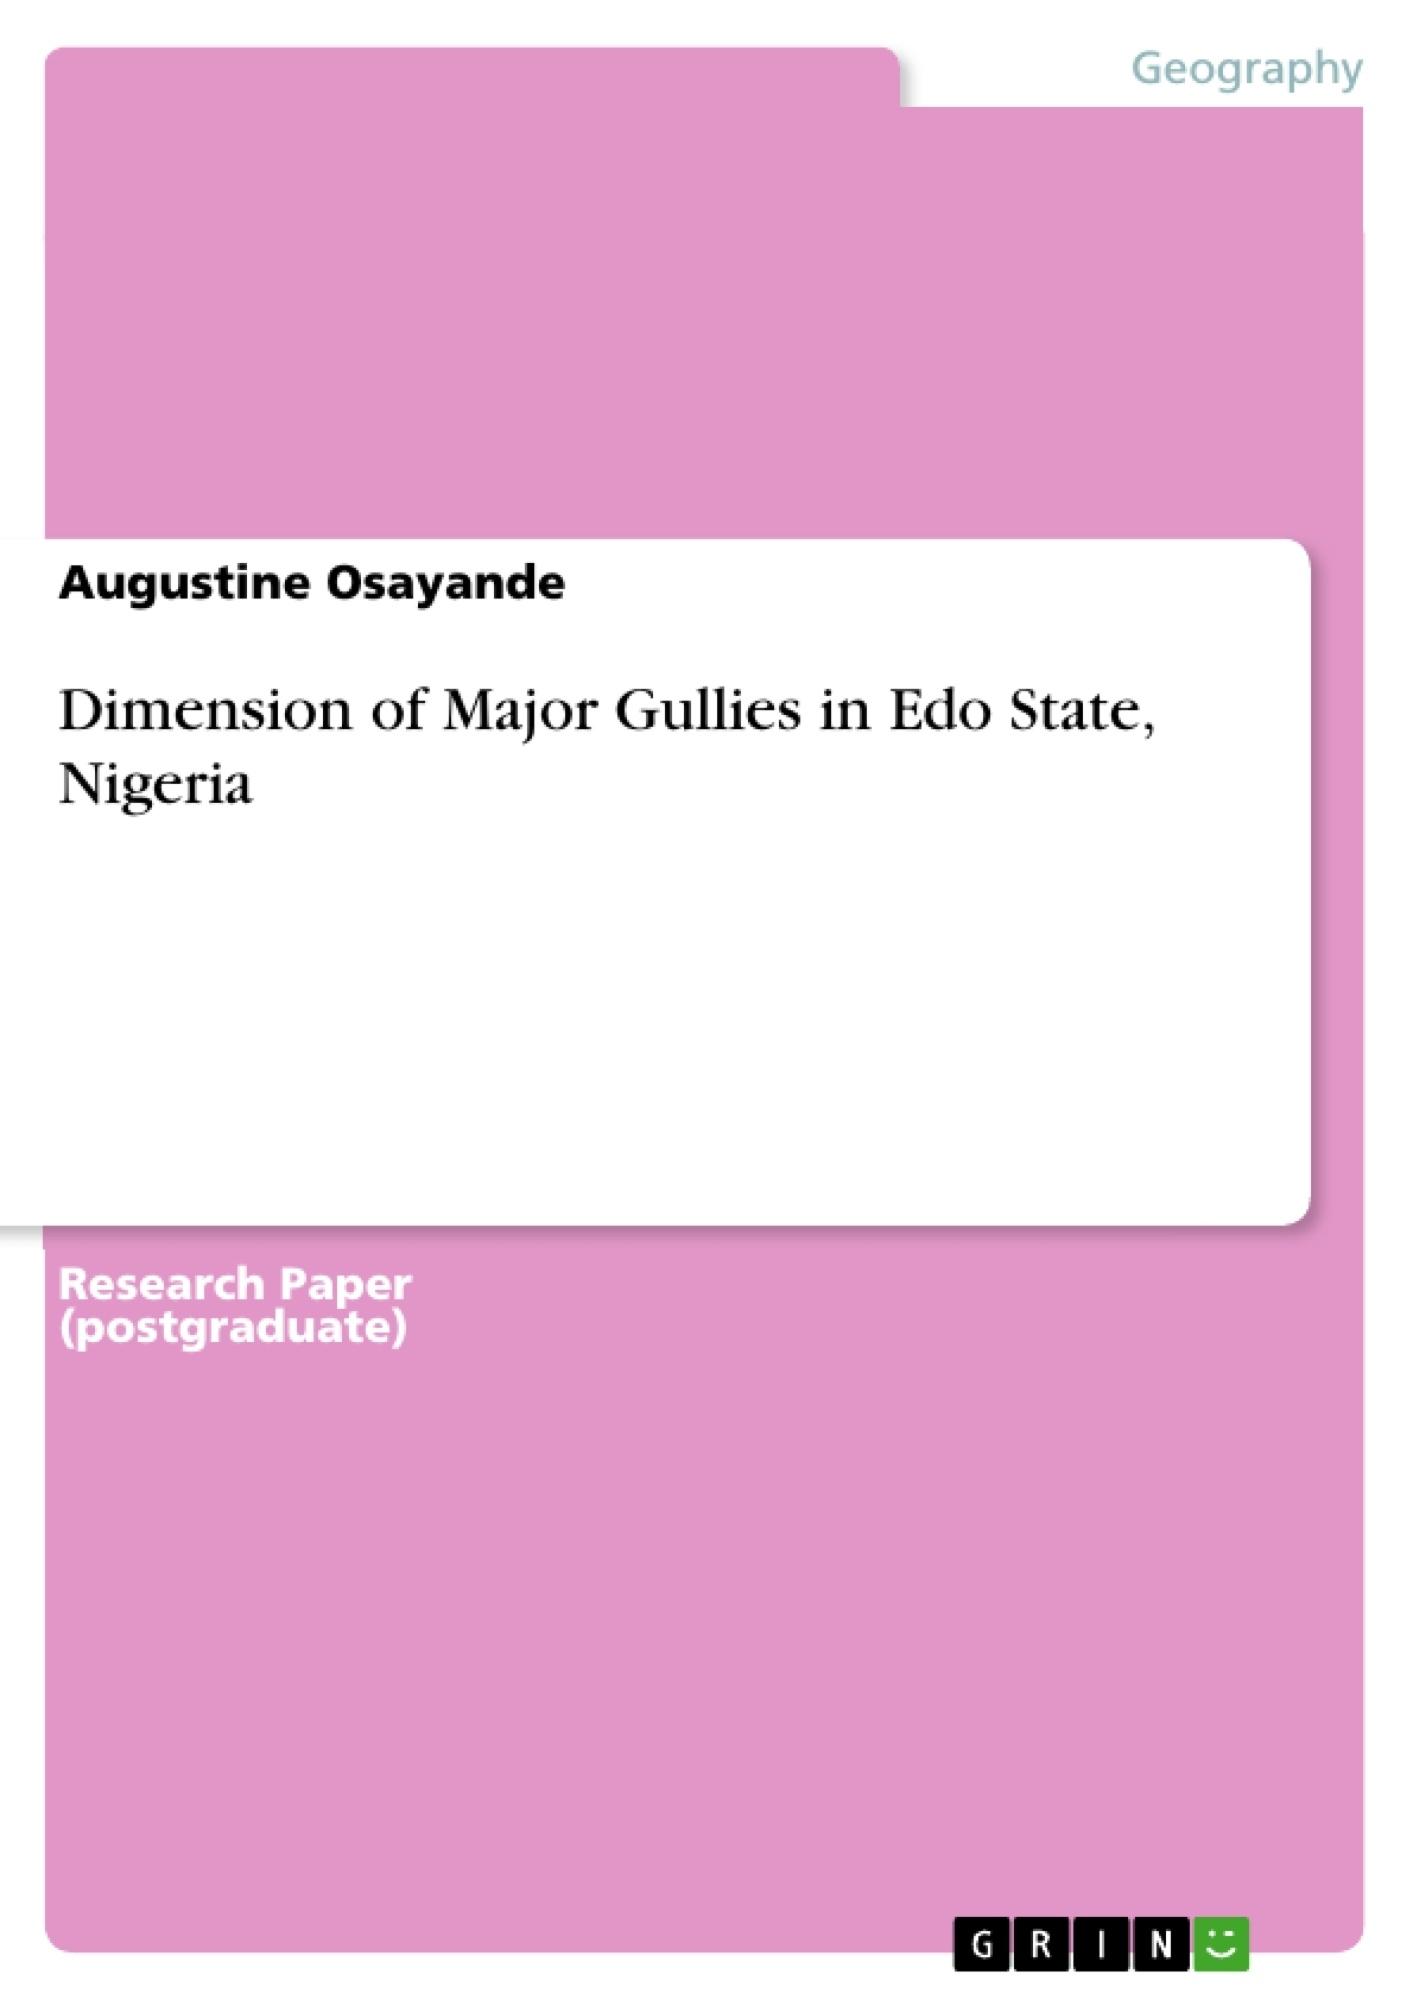 Title: Dimension of Major Gullies in Edo State, Nigeria